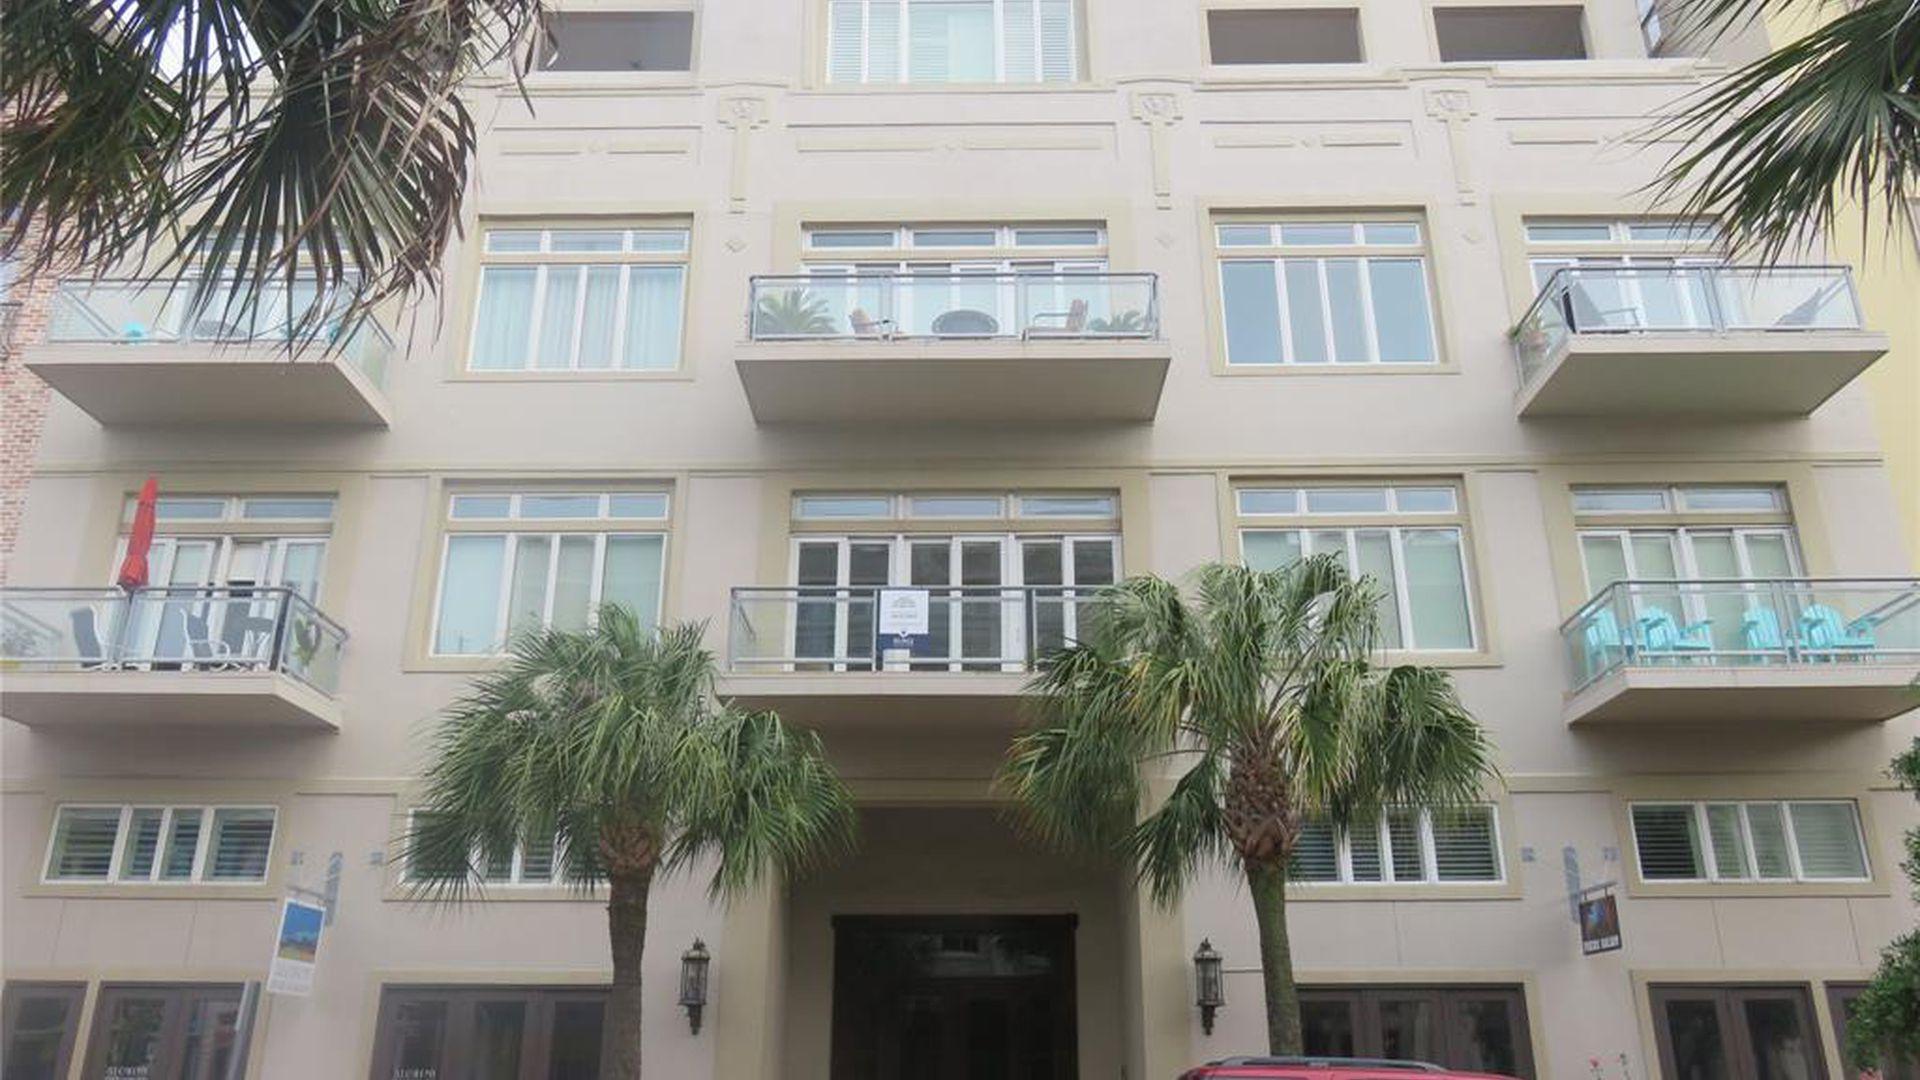 Office Space - Galveston Real Estate - Galveston TX Homes For Sale